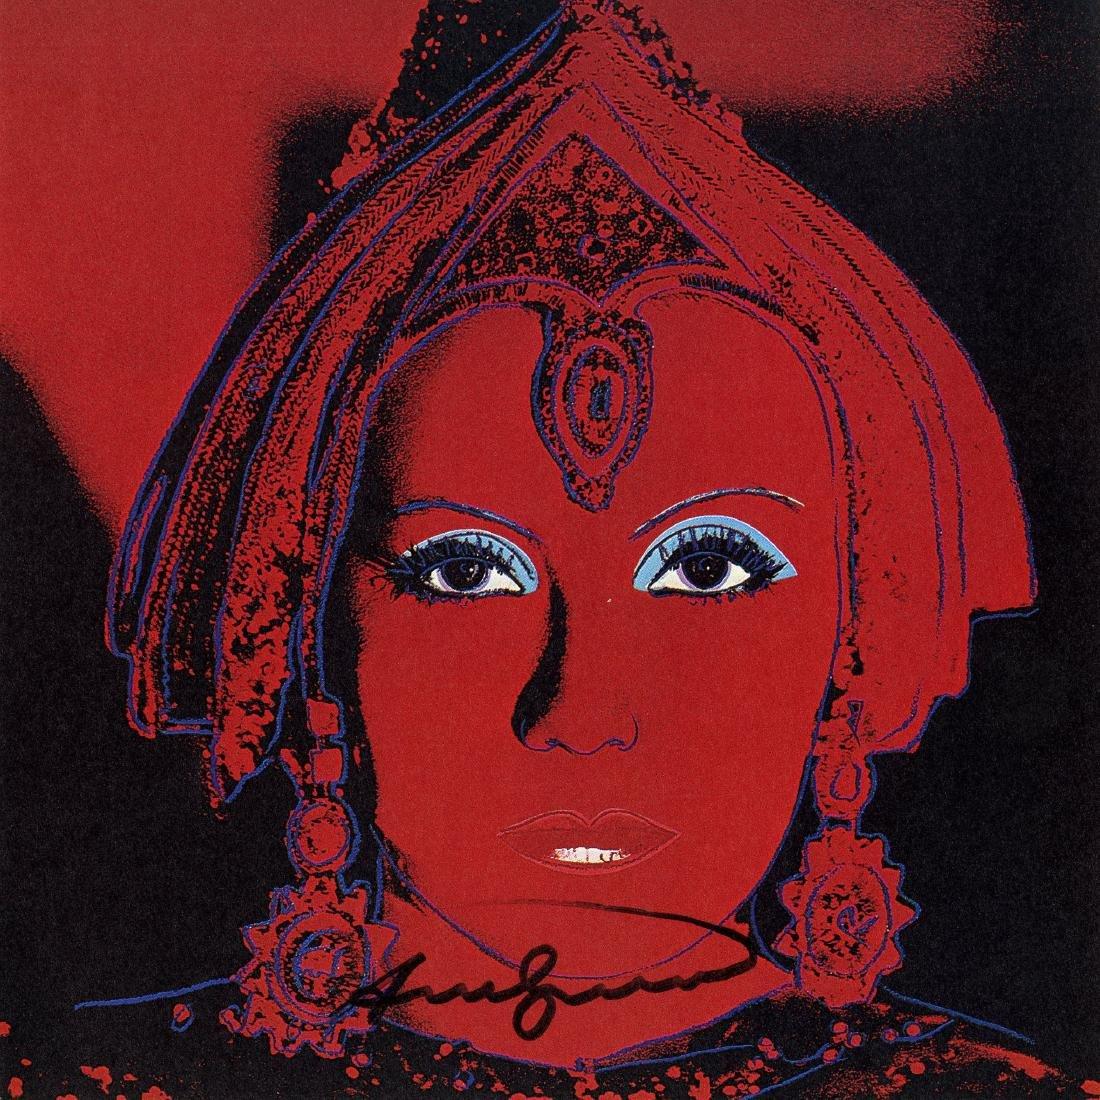 712: ANDY WARHOL - The Star [Greta Garbo as Mata Hari]